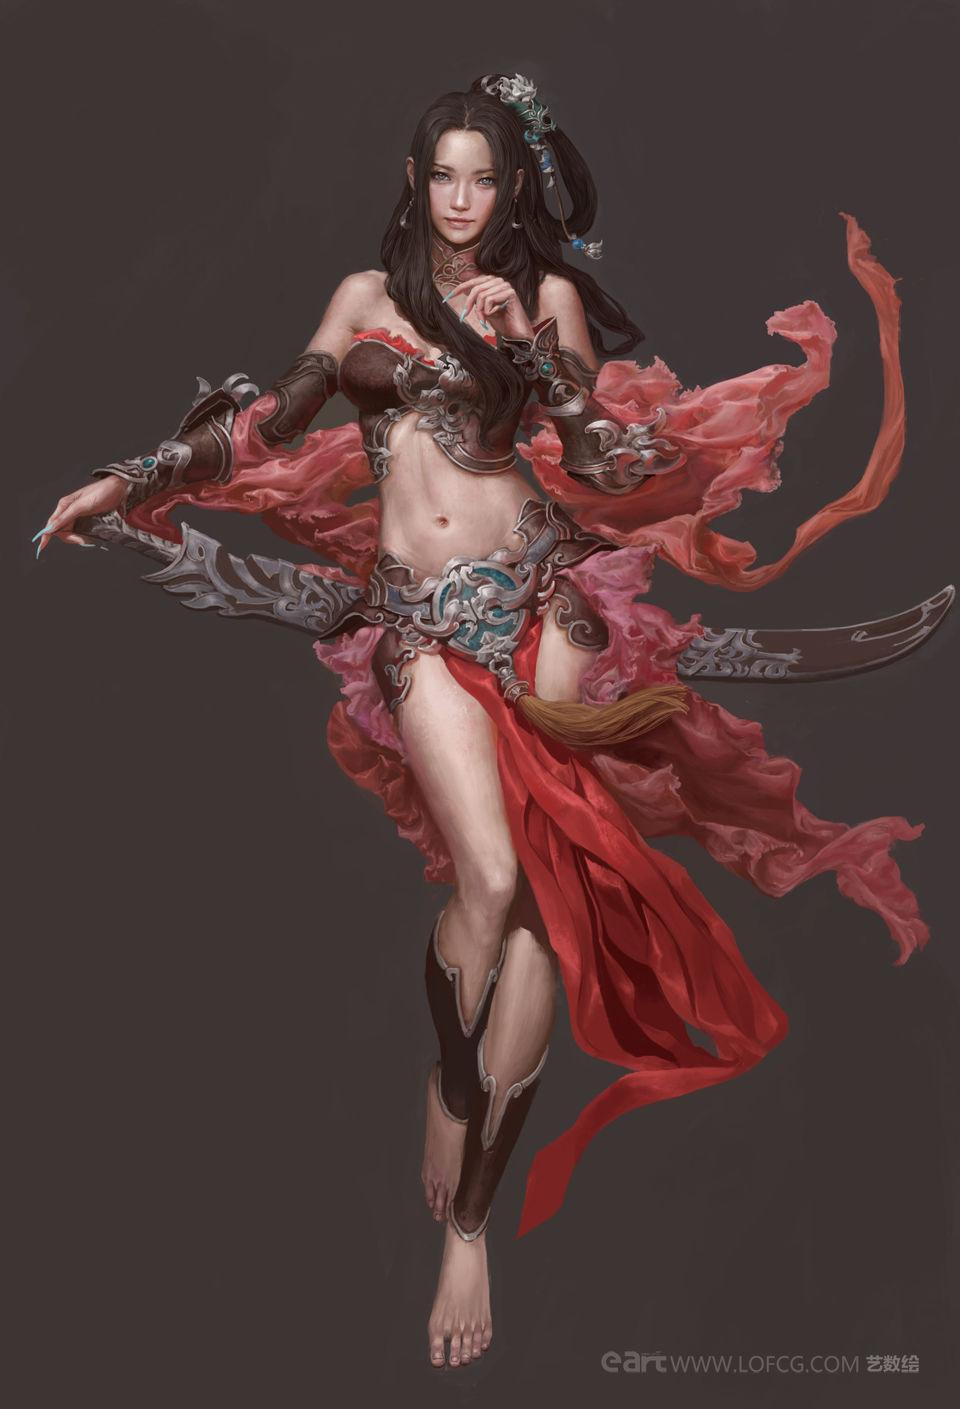 https://orig10.deviantart.net/ac4b/f/2016/238/1/5/princess_by_fenghuaart-dafc6m2.jpg